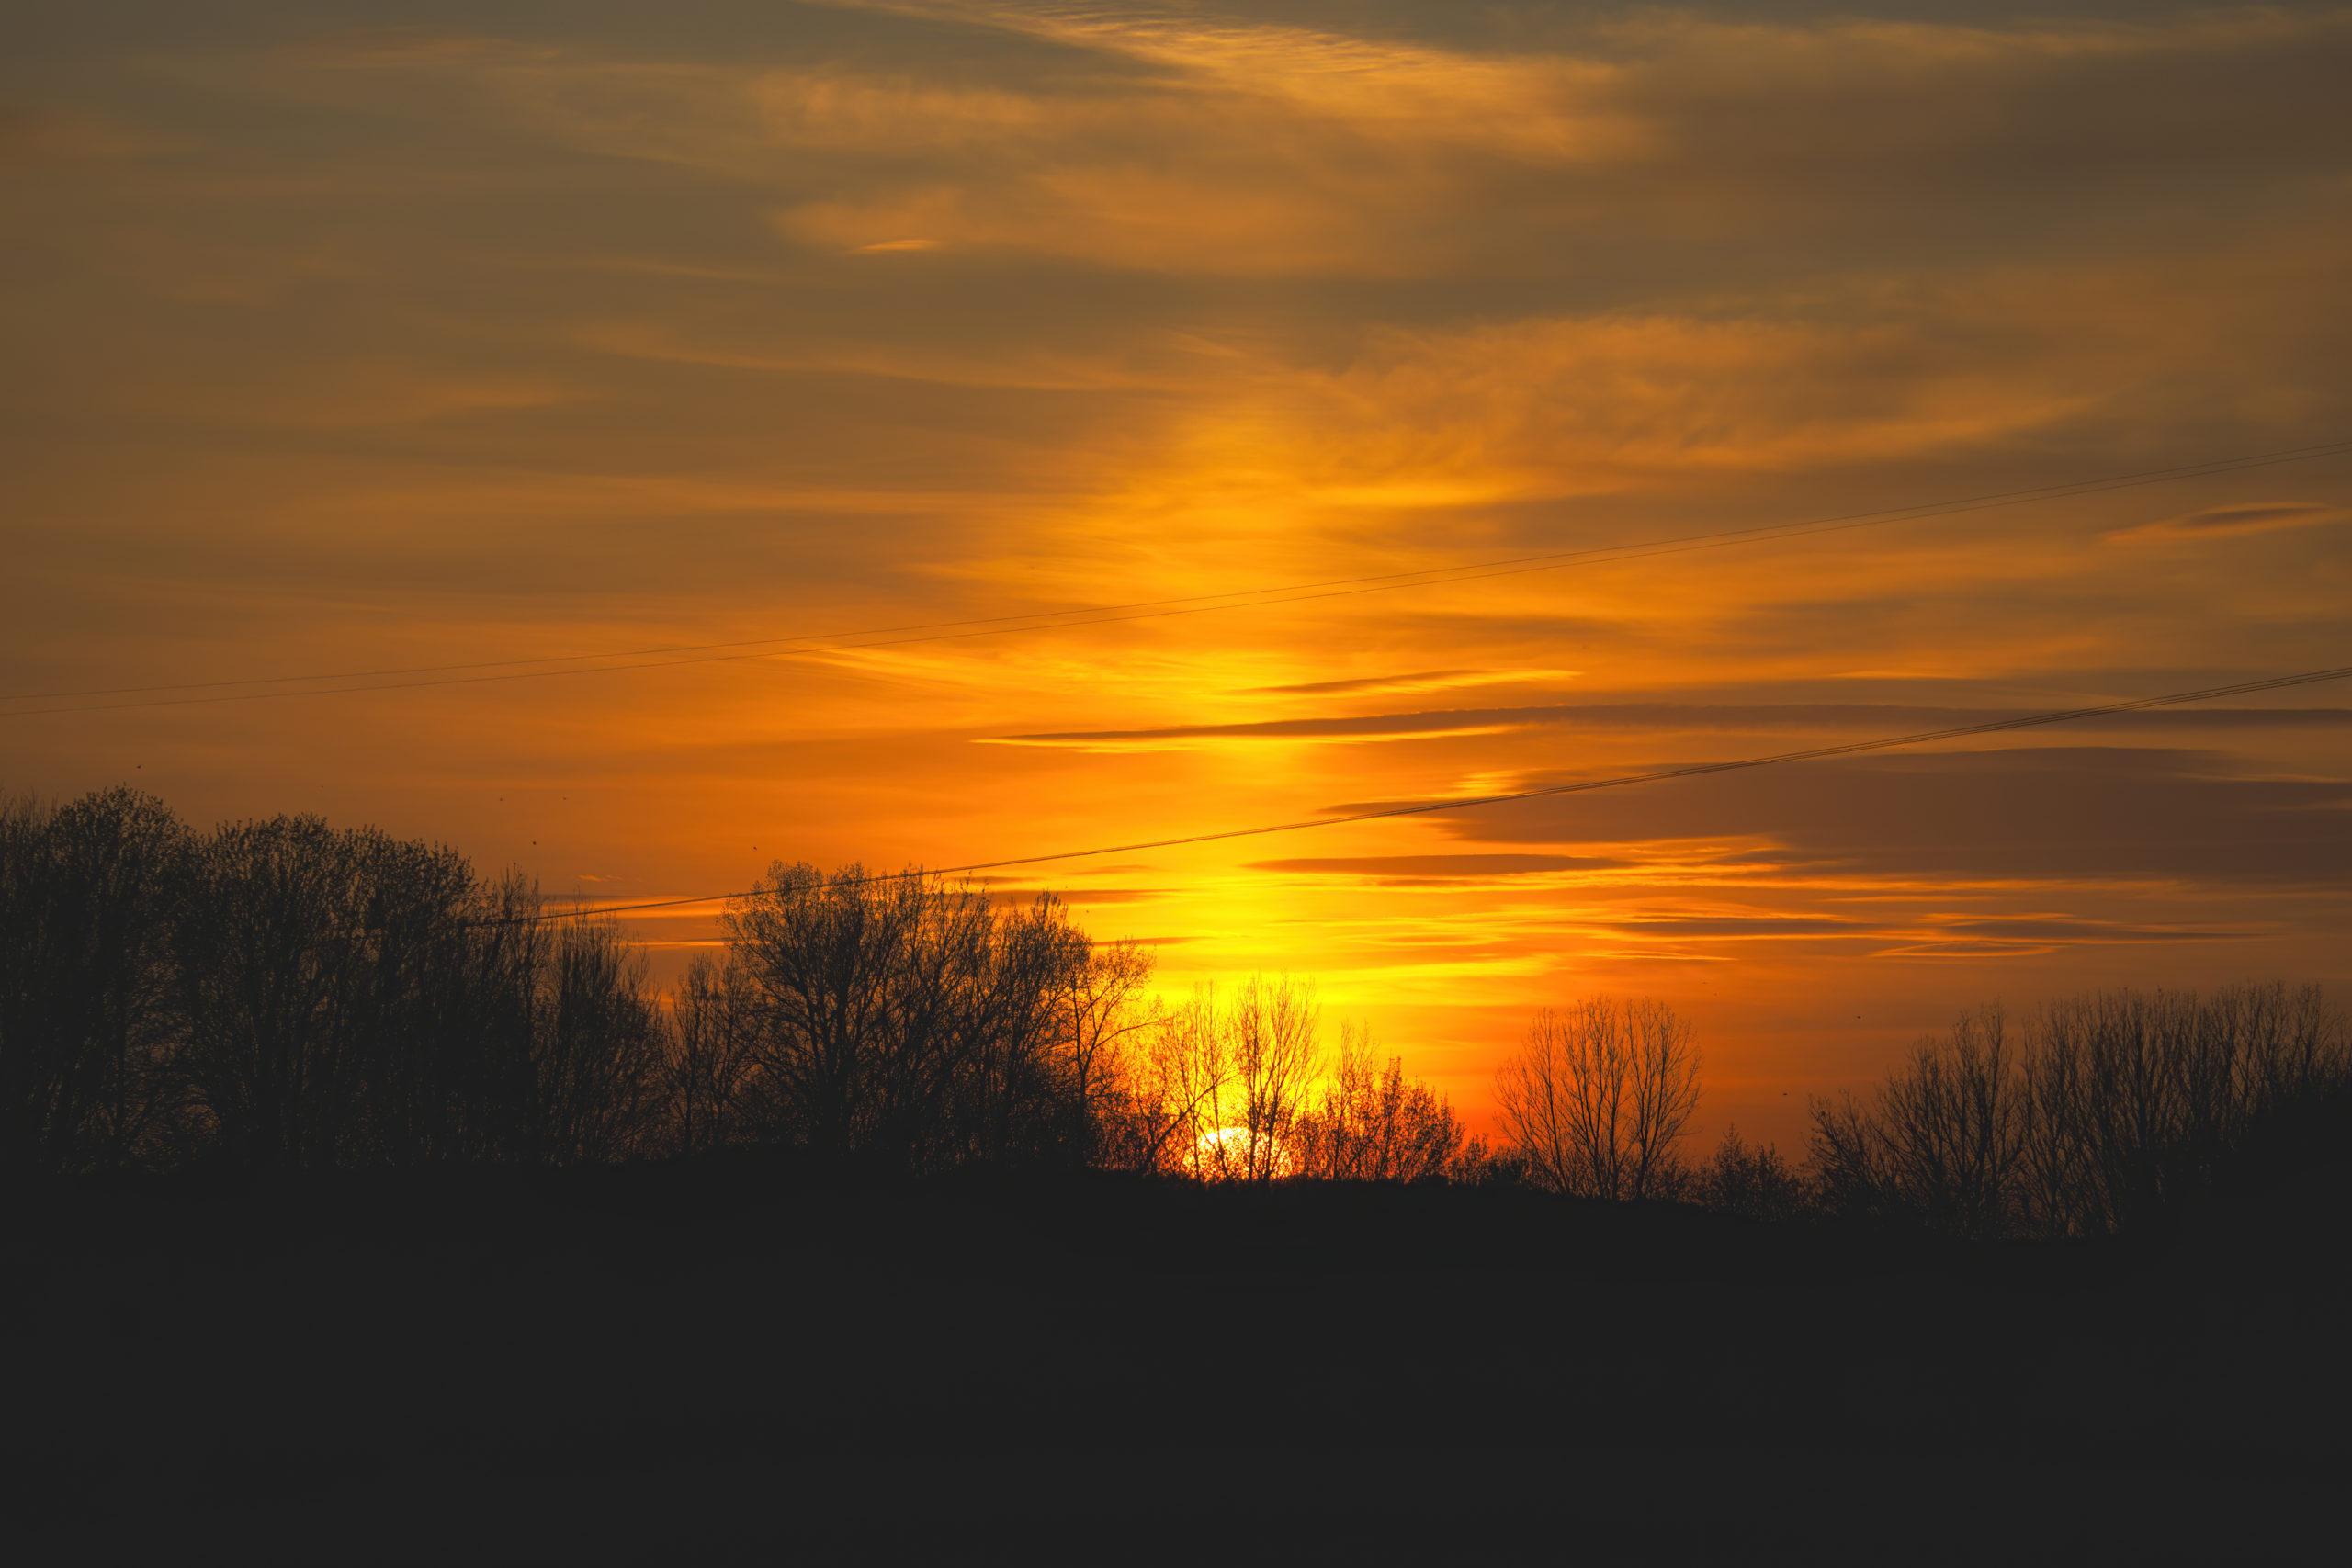 Sunset_1-denoise-denoise